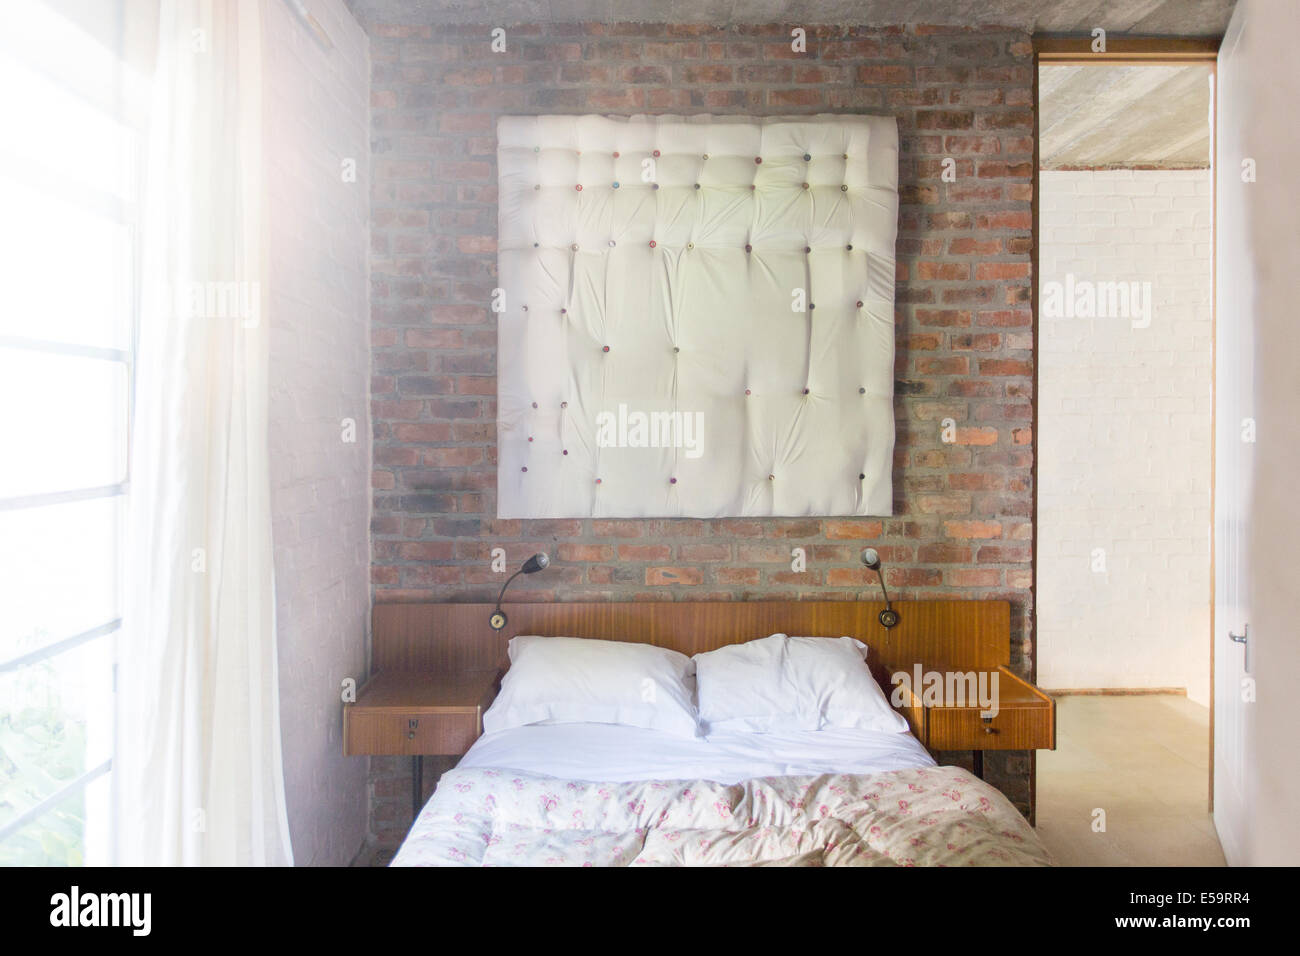 Para colgar en pared en dormitorio moderno Imagen De Stock